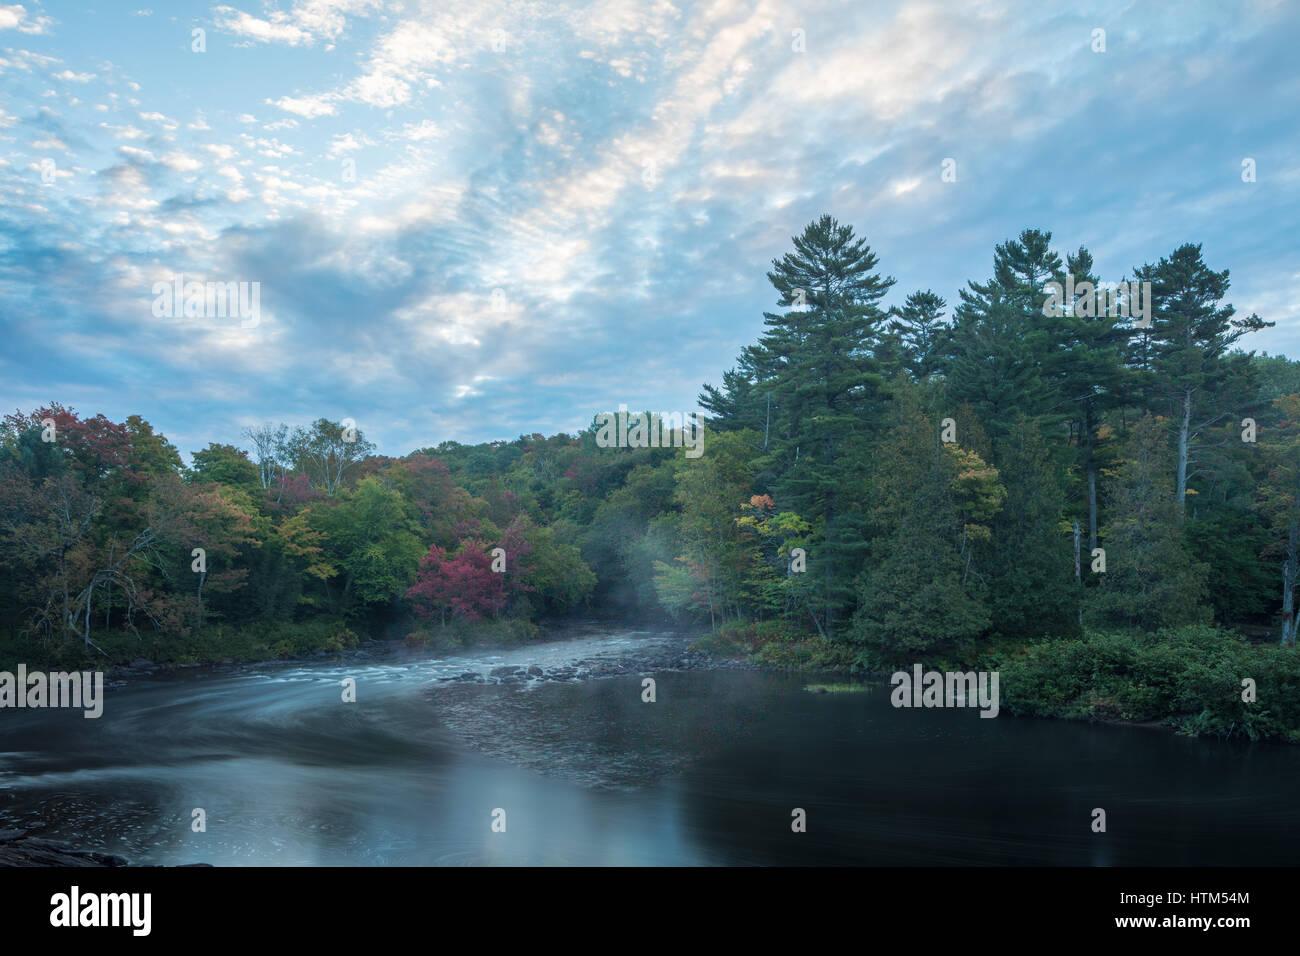 Couleurs d'automne, Oxtongue Rapids, Muskoka, Ontario, Canada Banque D'Images